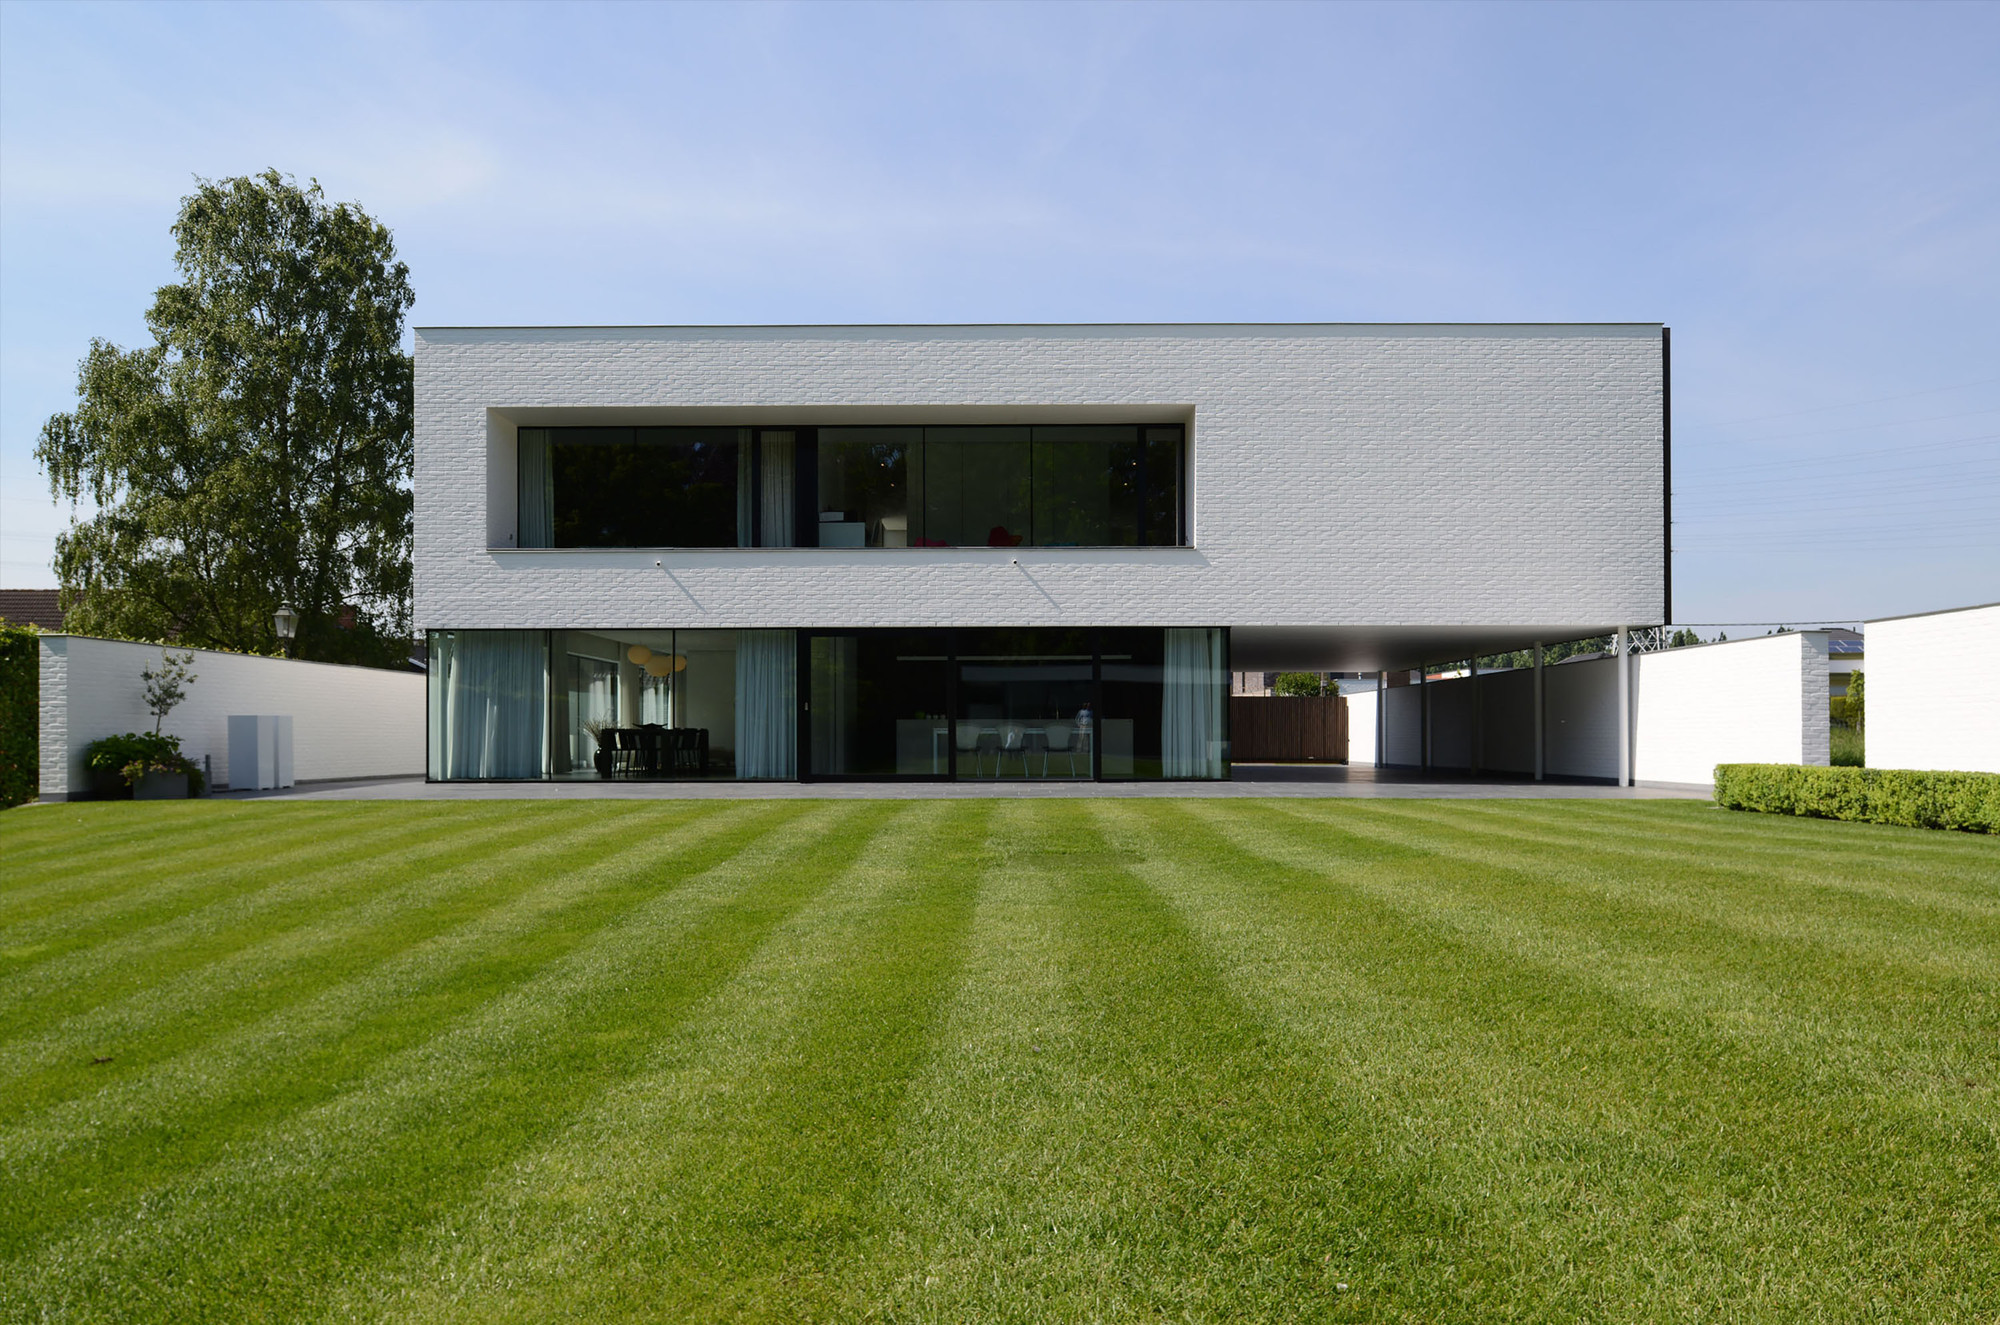 Villa gfr by de jaeghere architectuuratelier in roeselare for Construire maison minimaliste